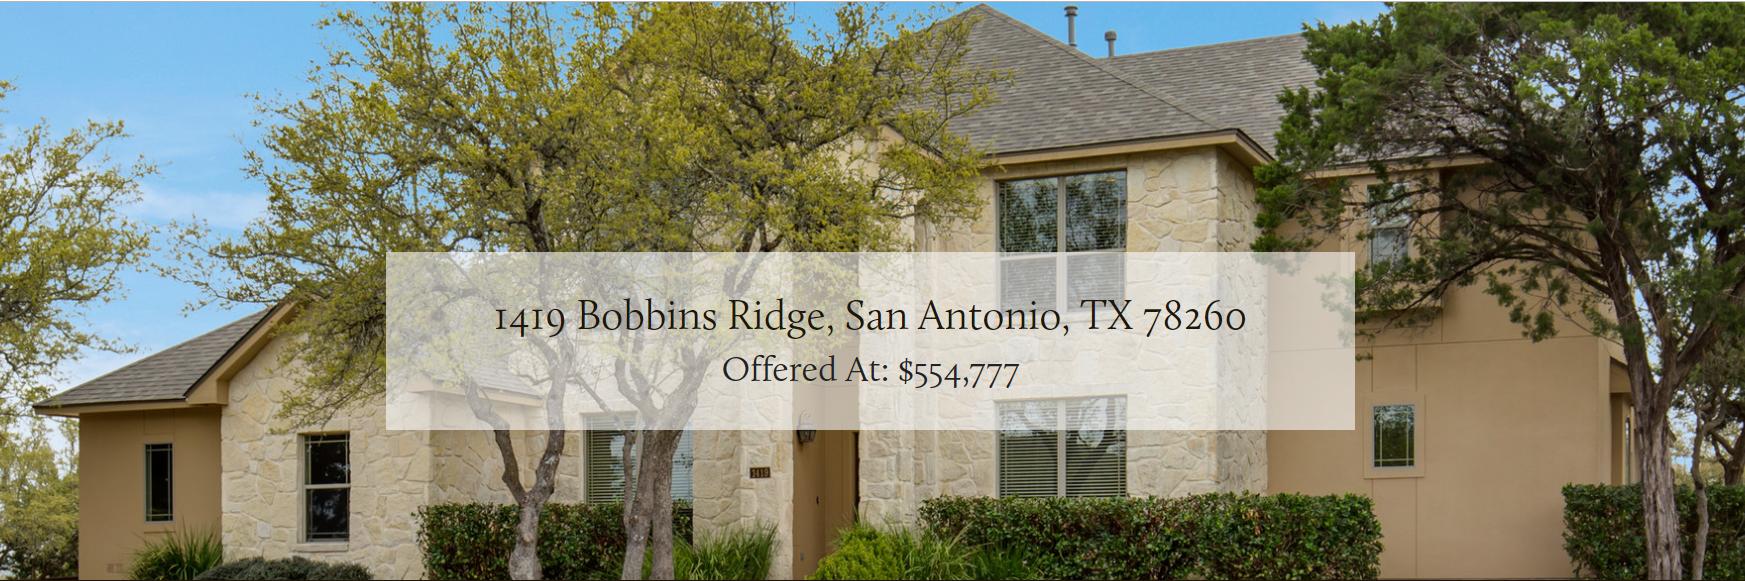 San Antonio House For Sale